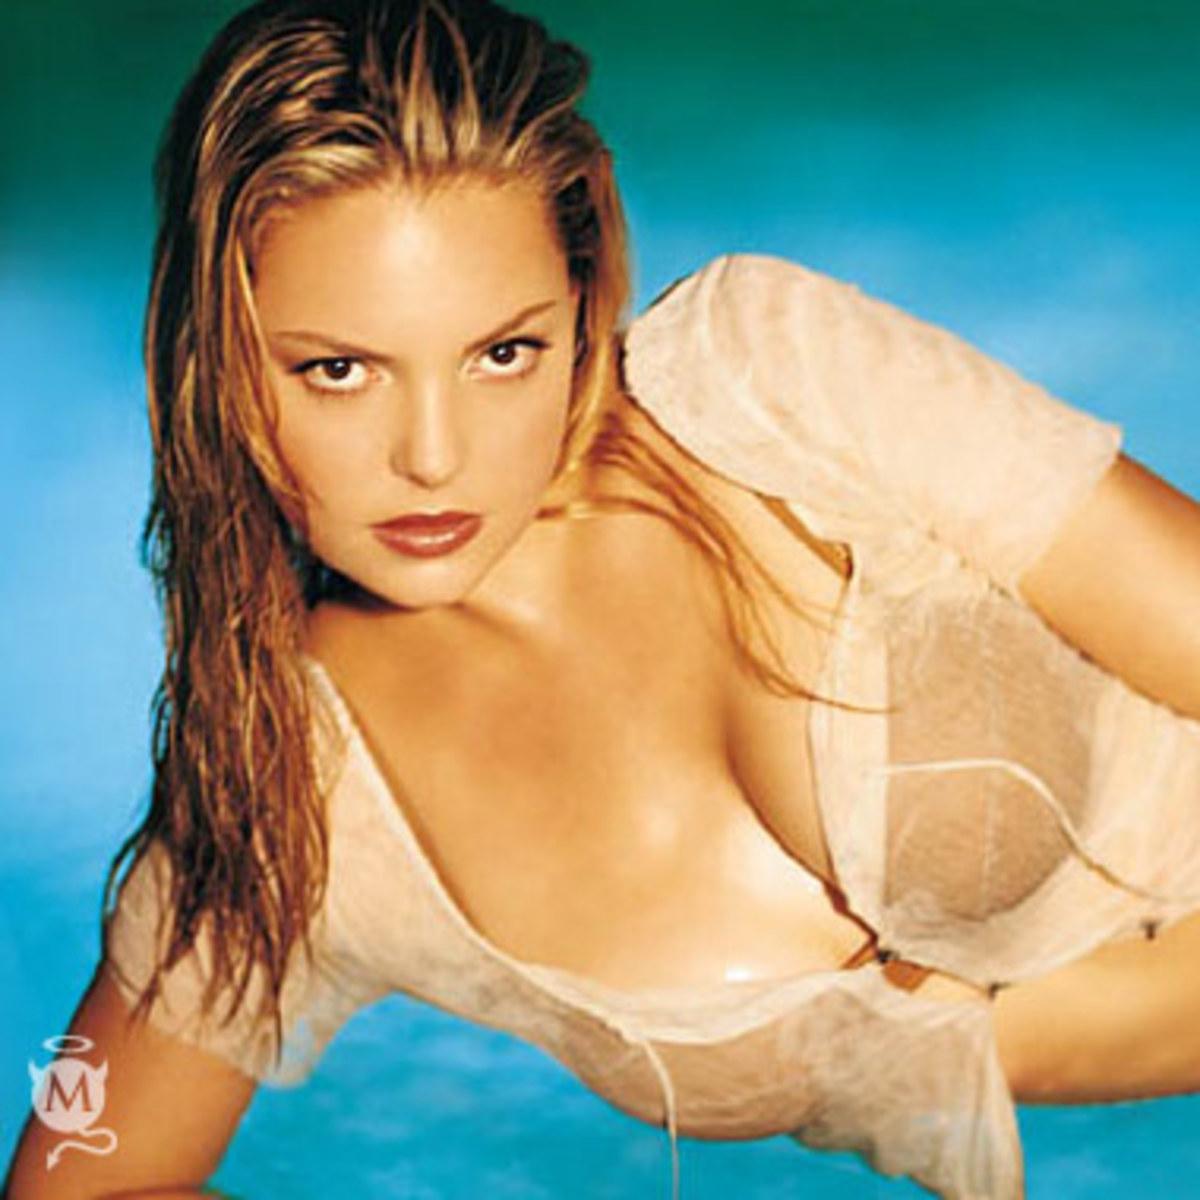 All wet Katherine Heigl